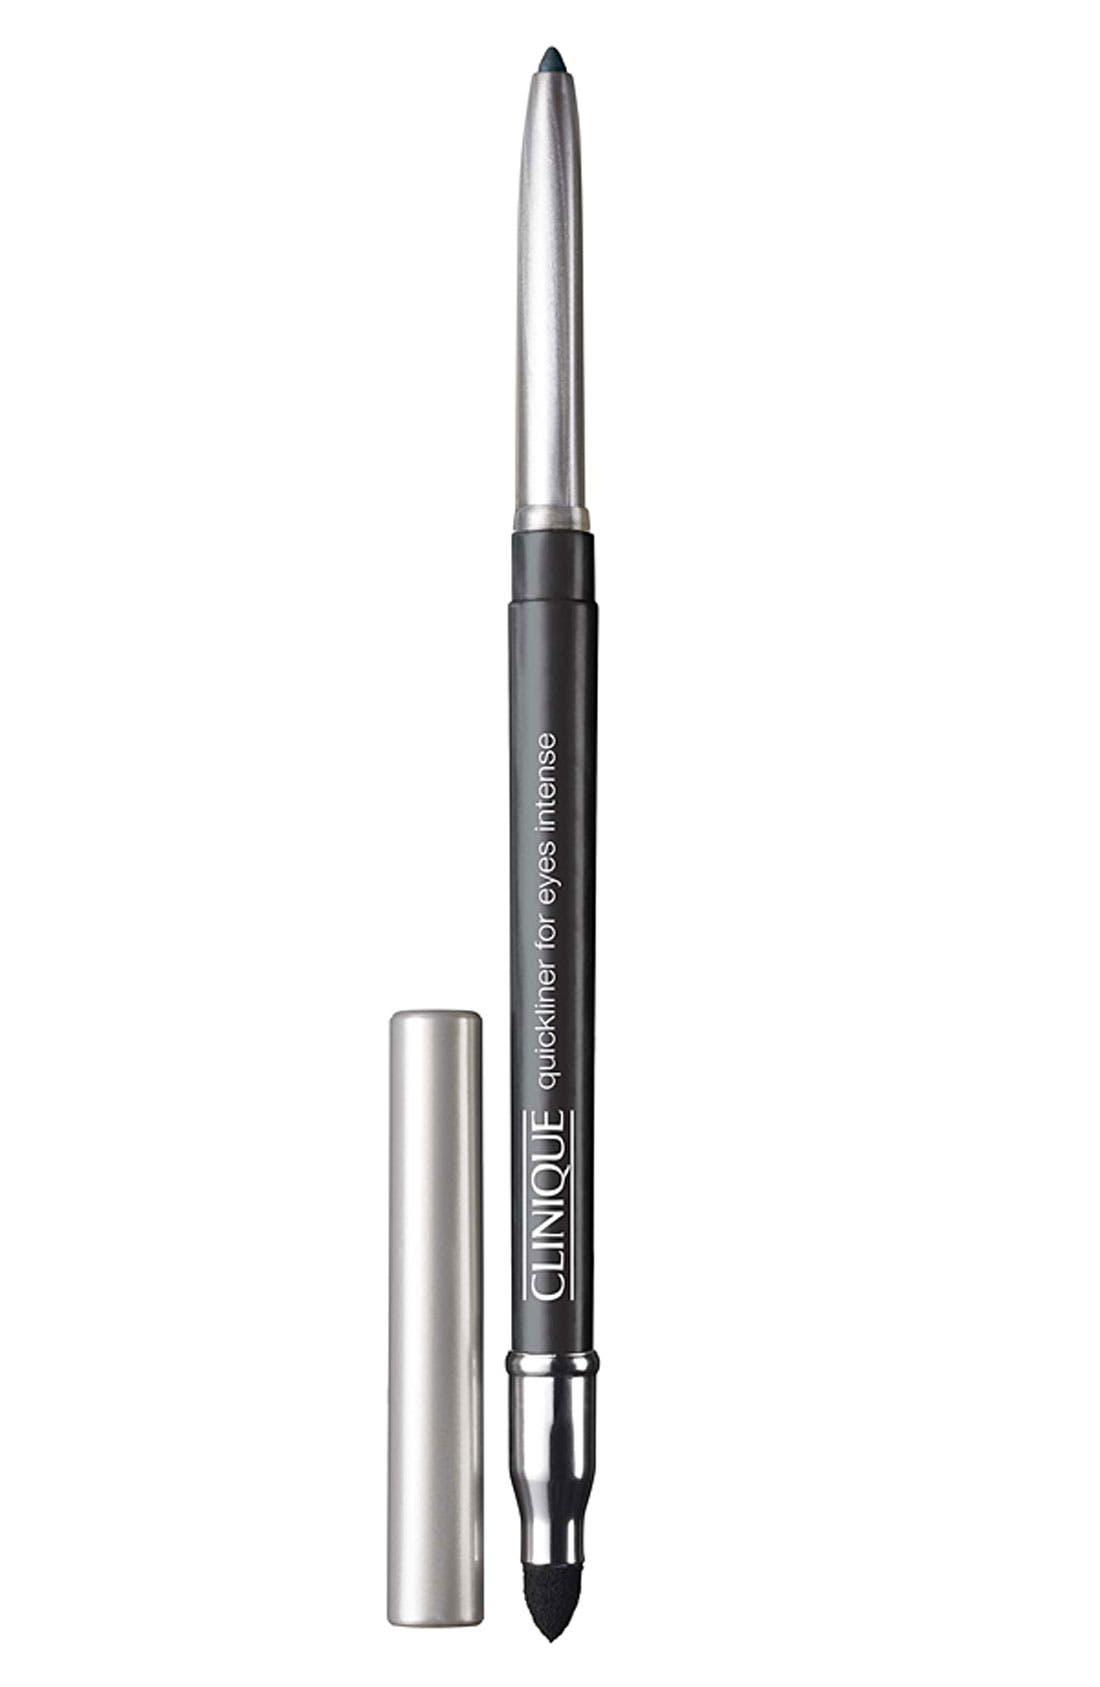 Clinique Quickliner For Eyes Intense Eyeliner Pencil -